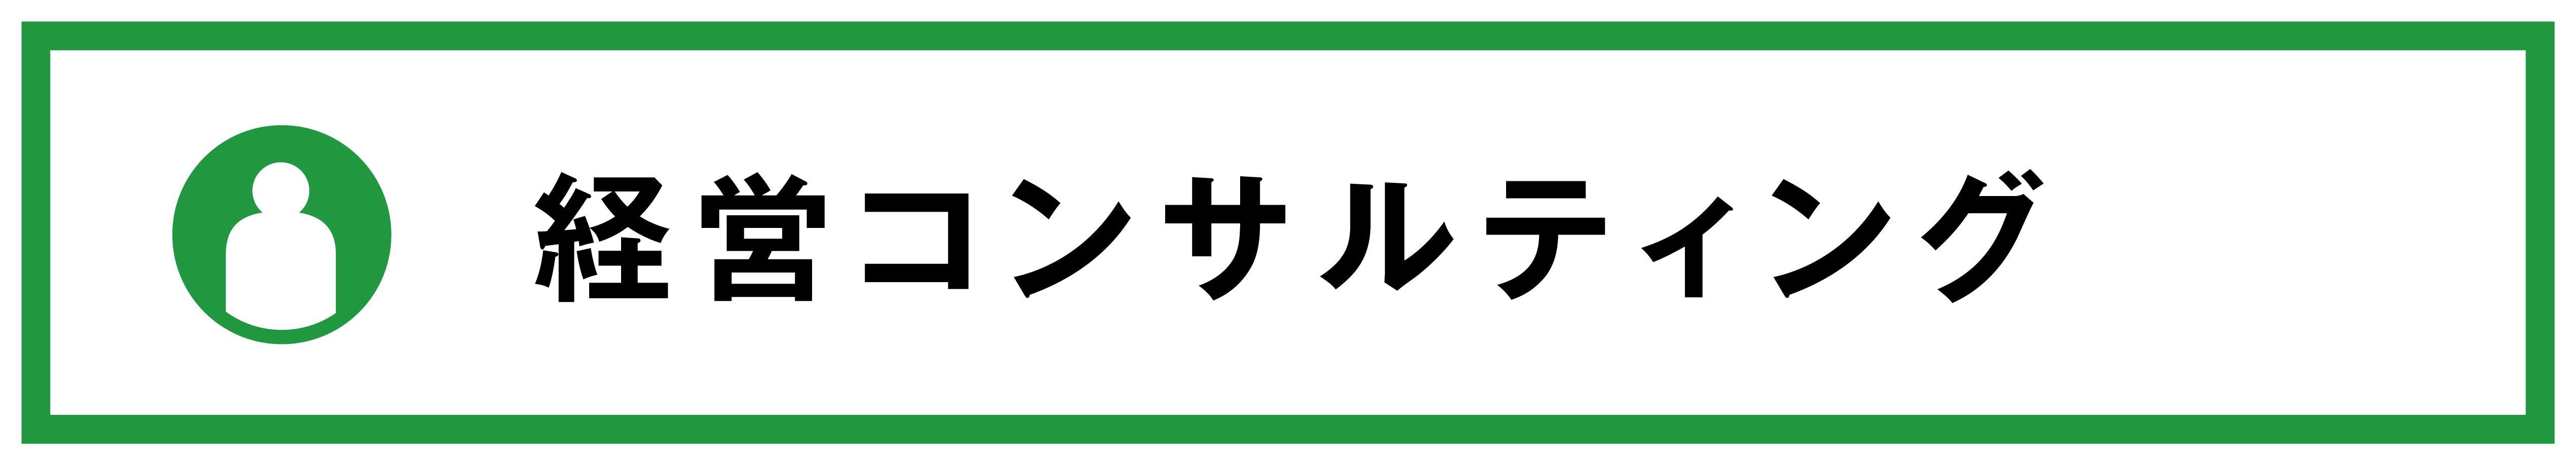 _blog_ハ?ナー 2-07.jpg